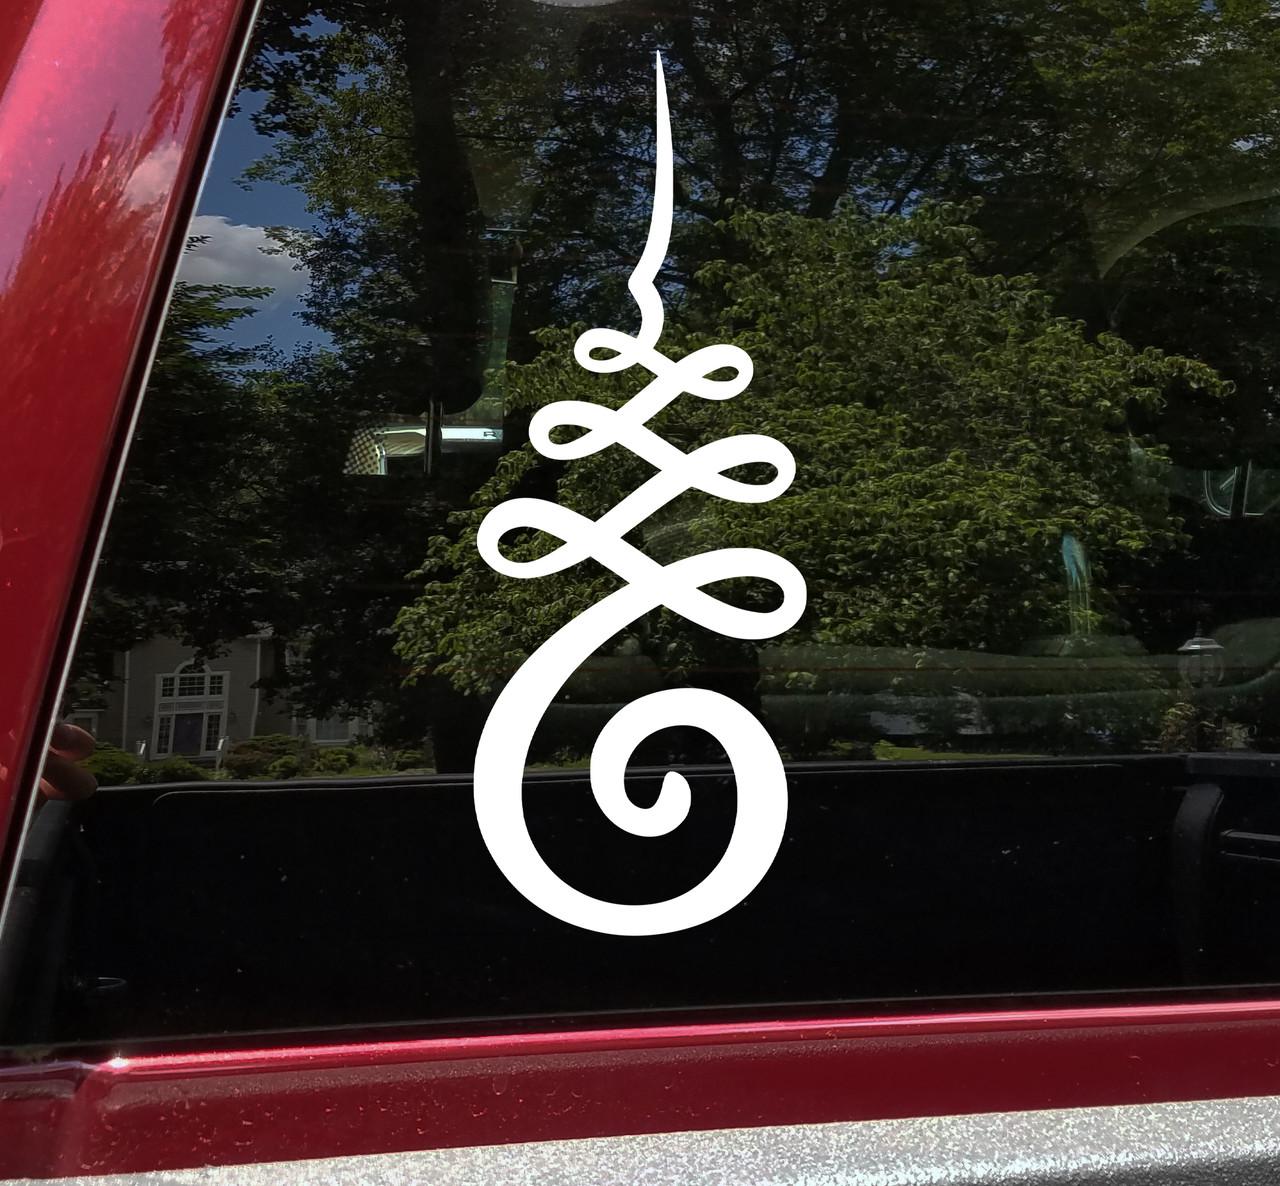 Unalome Buddhist Symbol Vinyl Decal - Enlightment Trasncendence - Die Cut Sticker